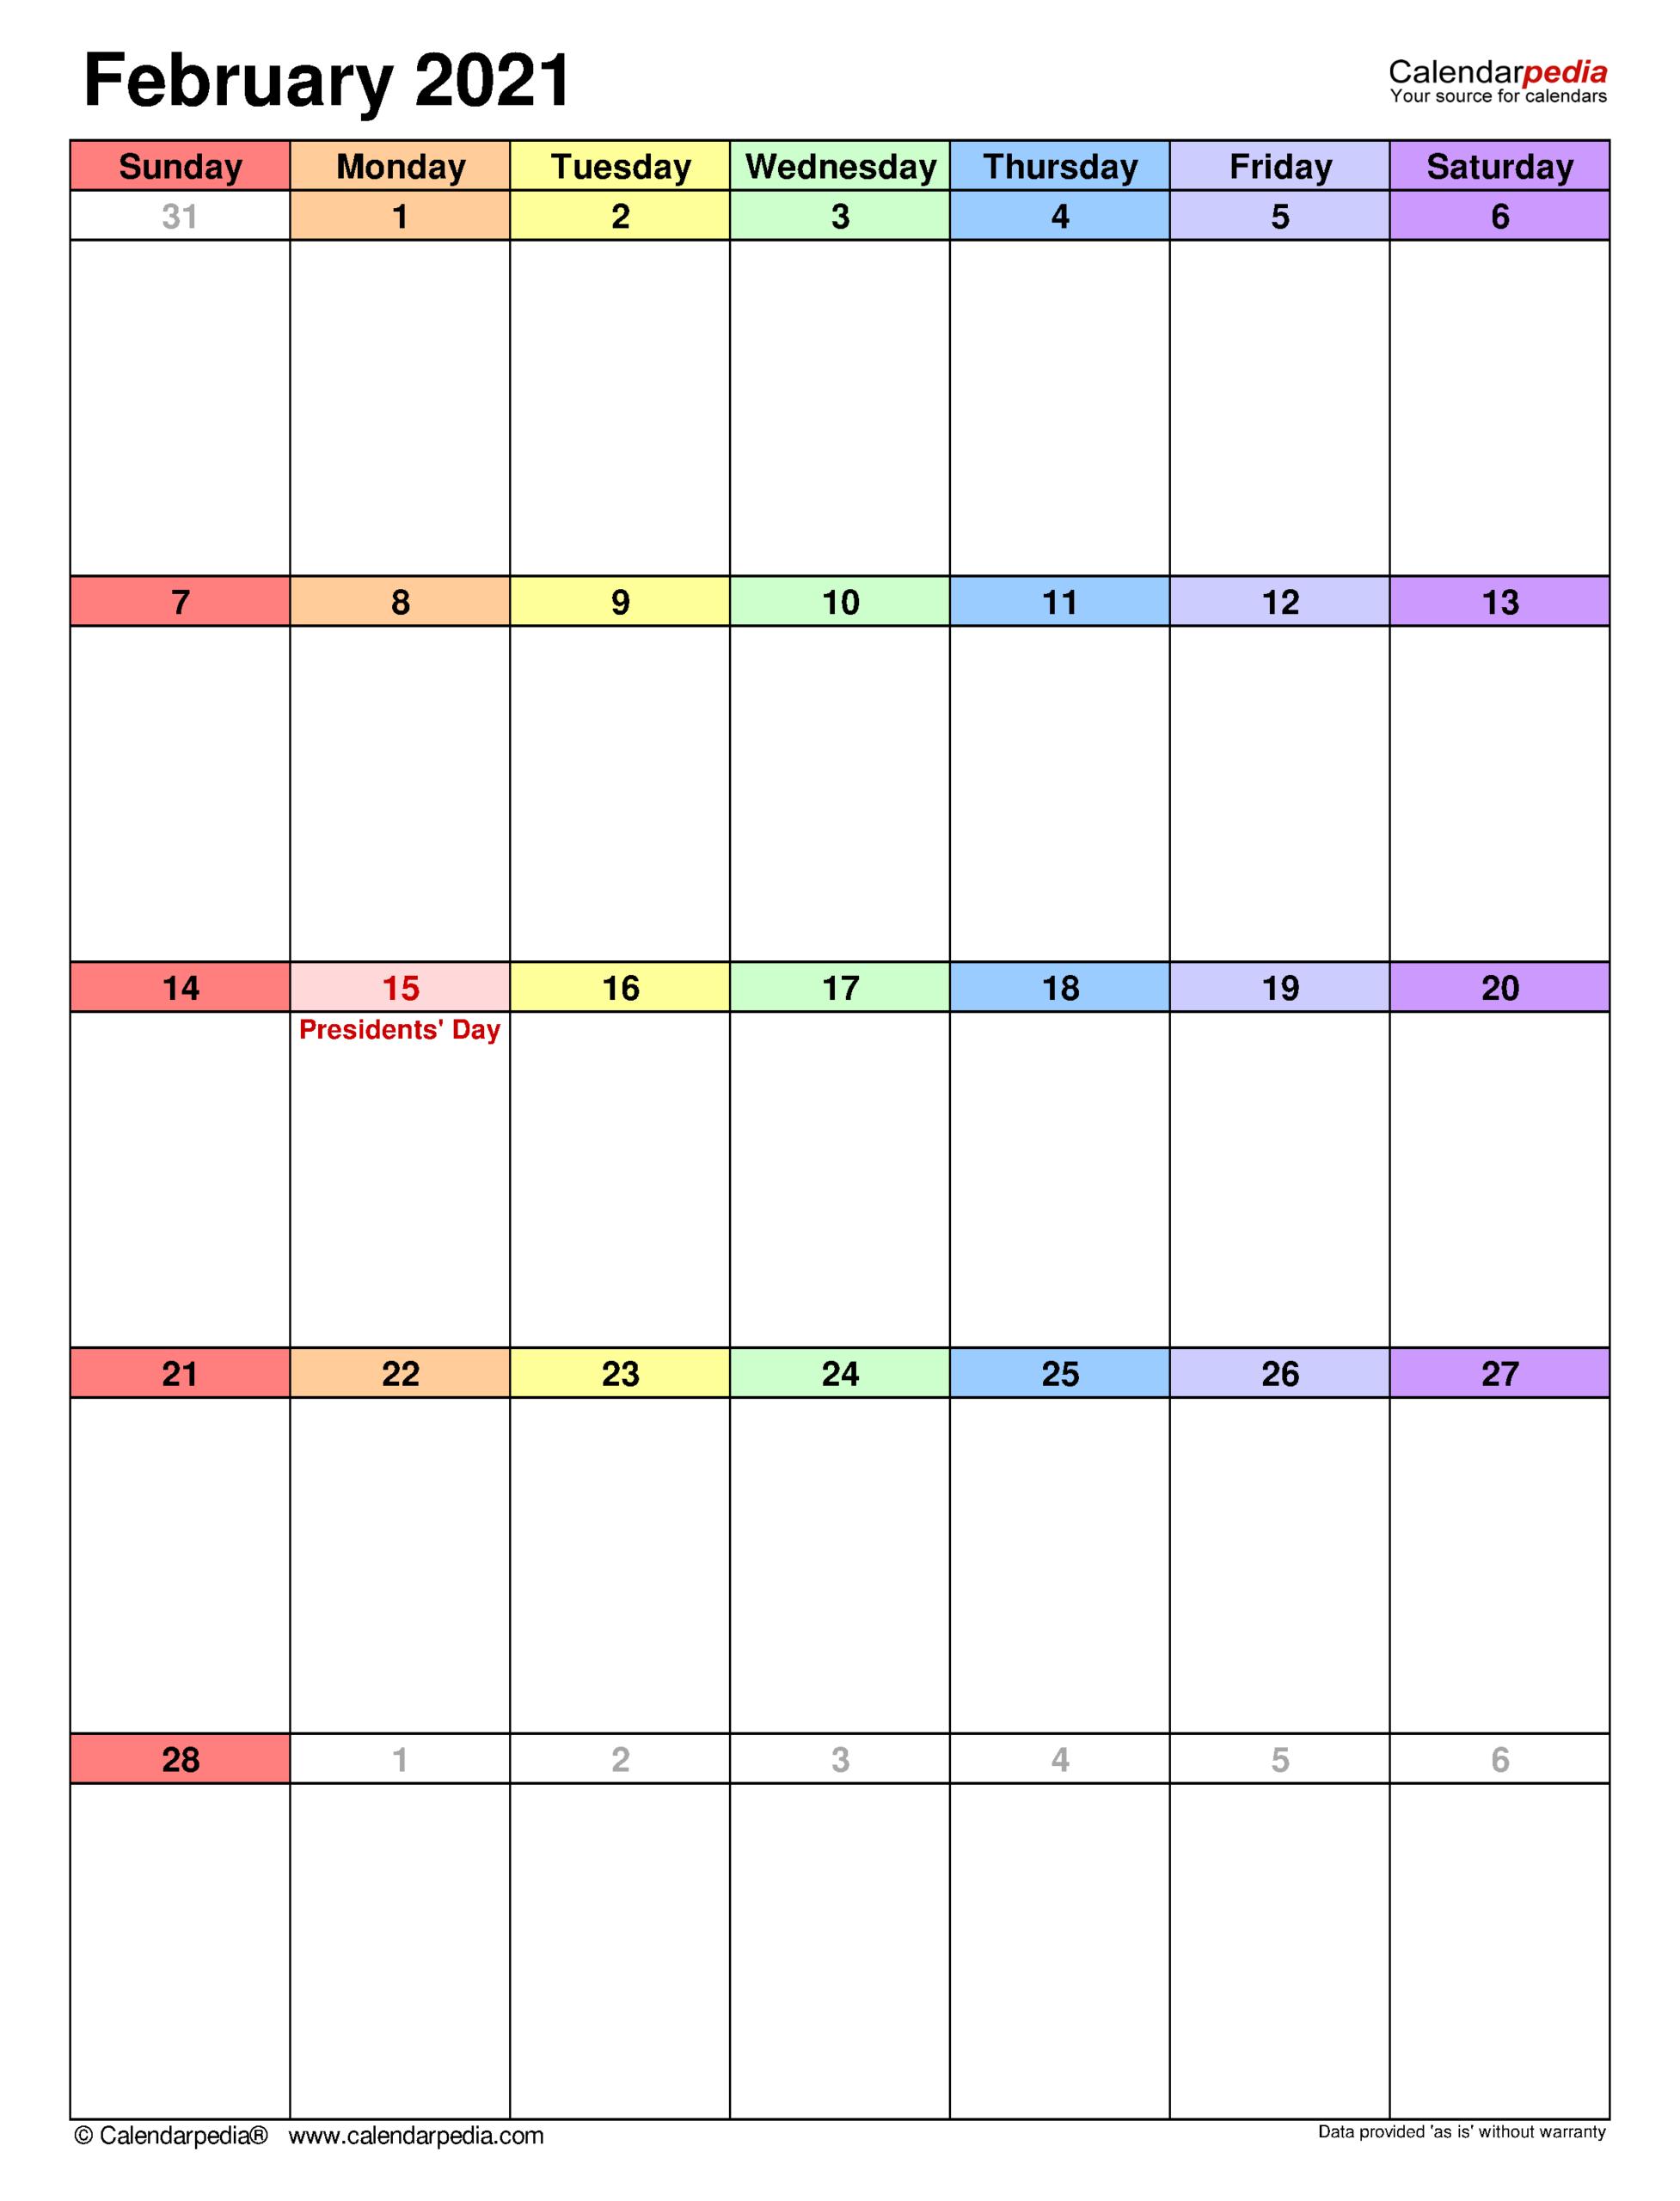 February 2021 Calendar   Templates For Word, Excel And Pdf  February 2021 Calendar Printable